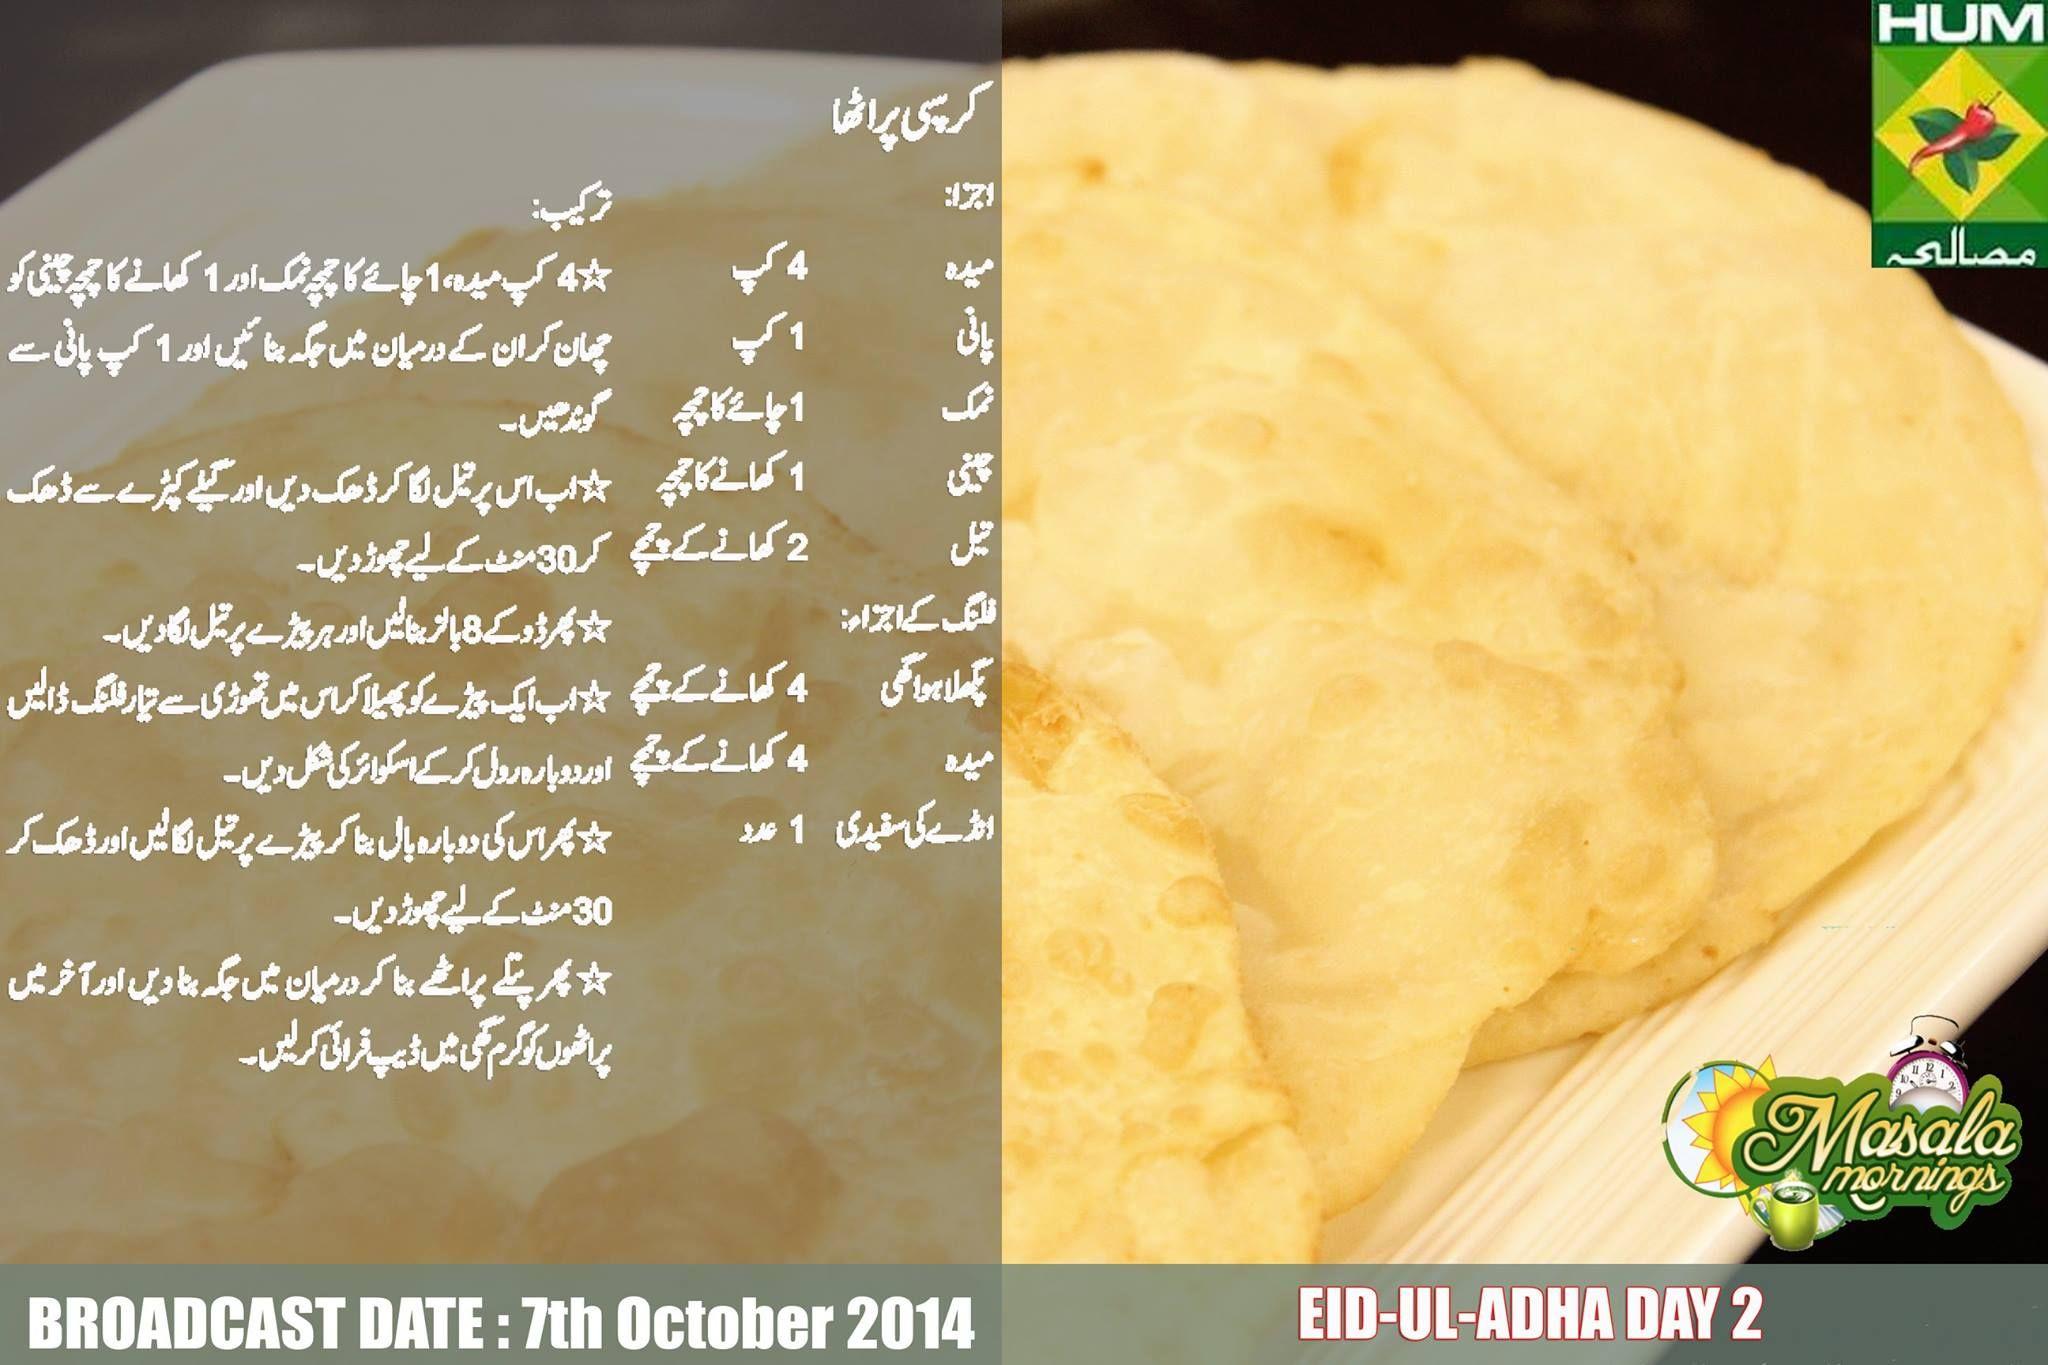 Crispy paratha masala tv recipies pinterest pakistani foodies forumfinder Images